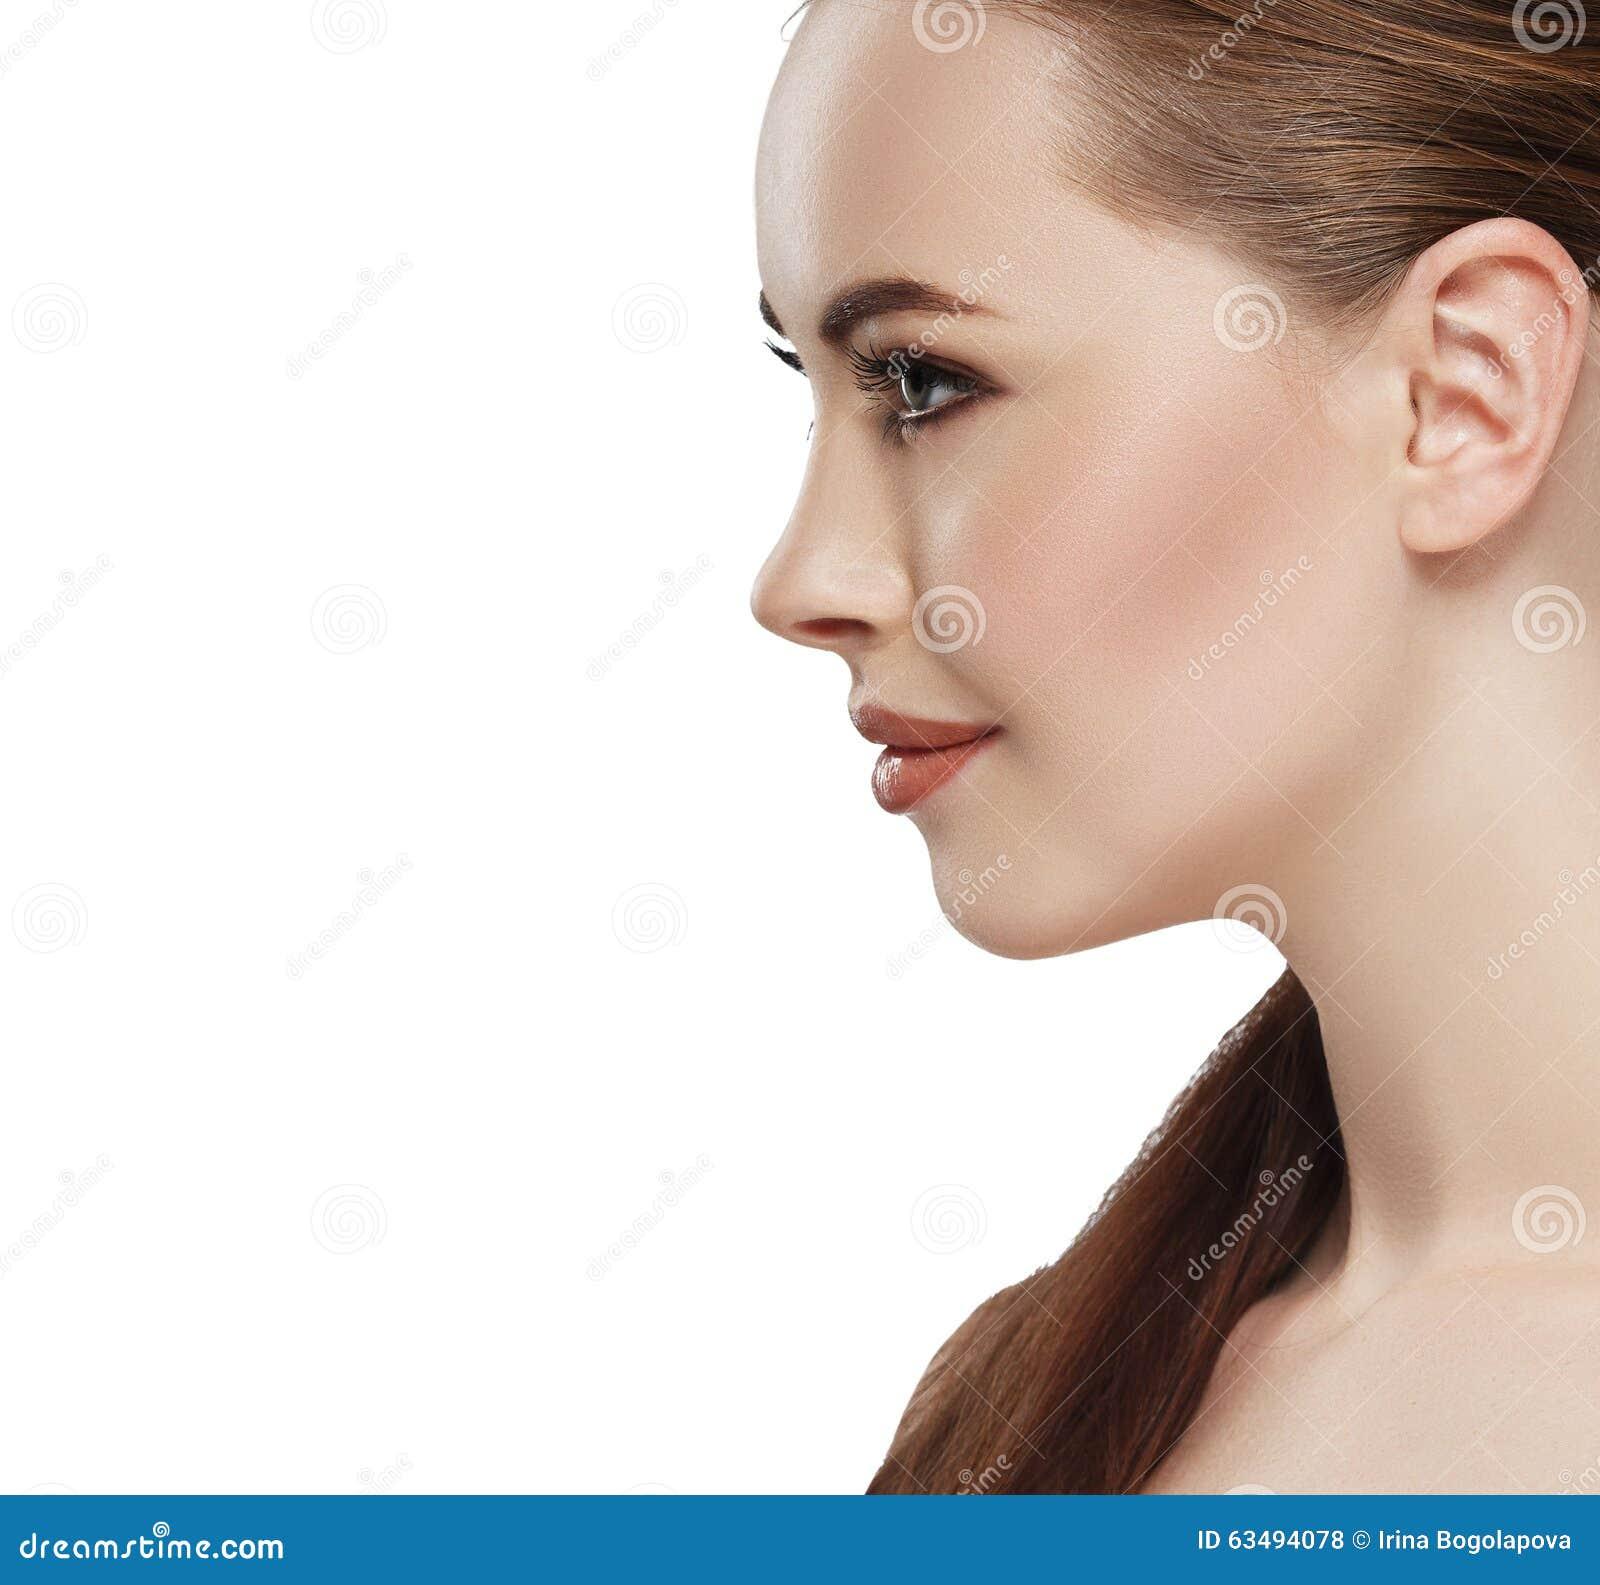 Beautiful Woman Glamour Clean Skin Face Portrait Profile